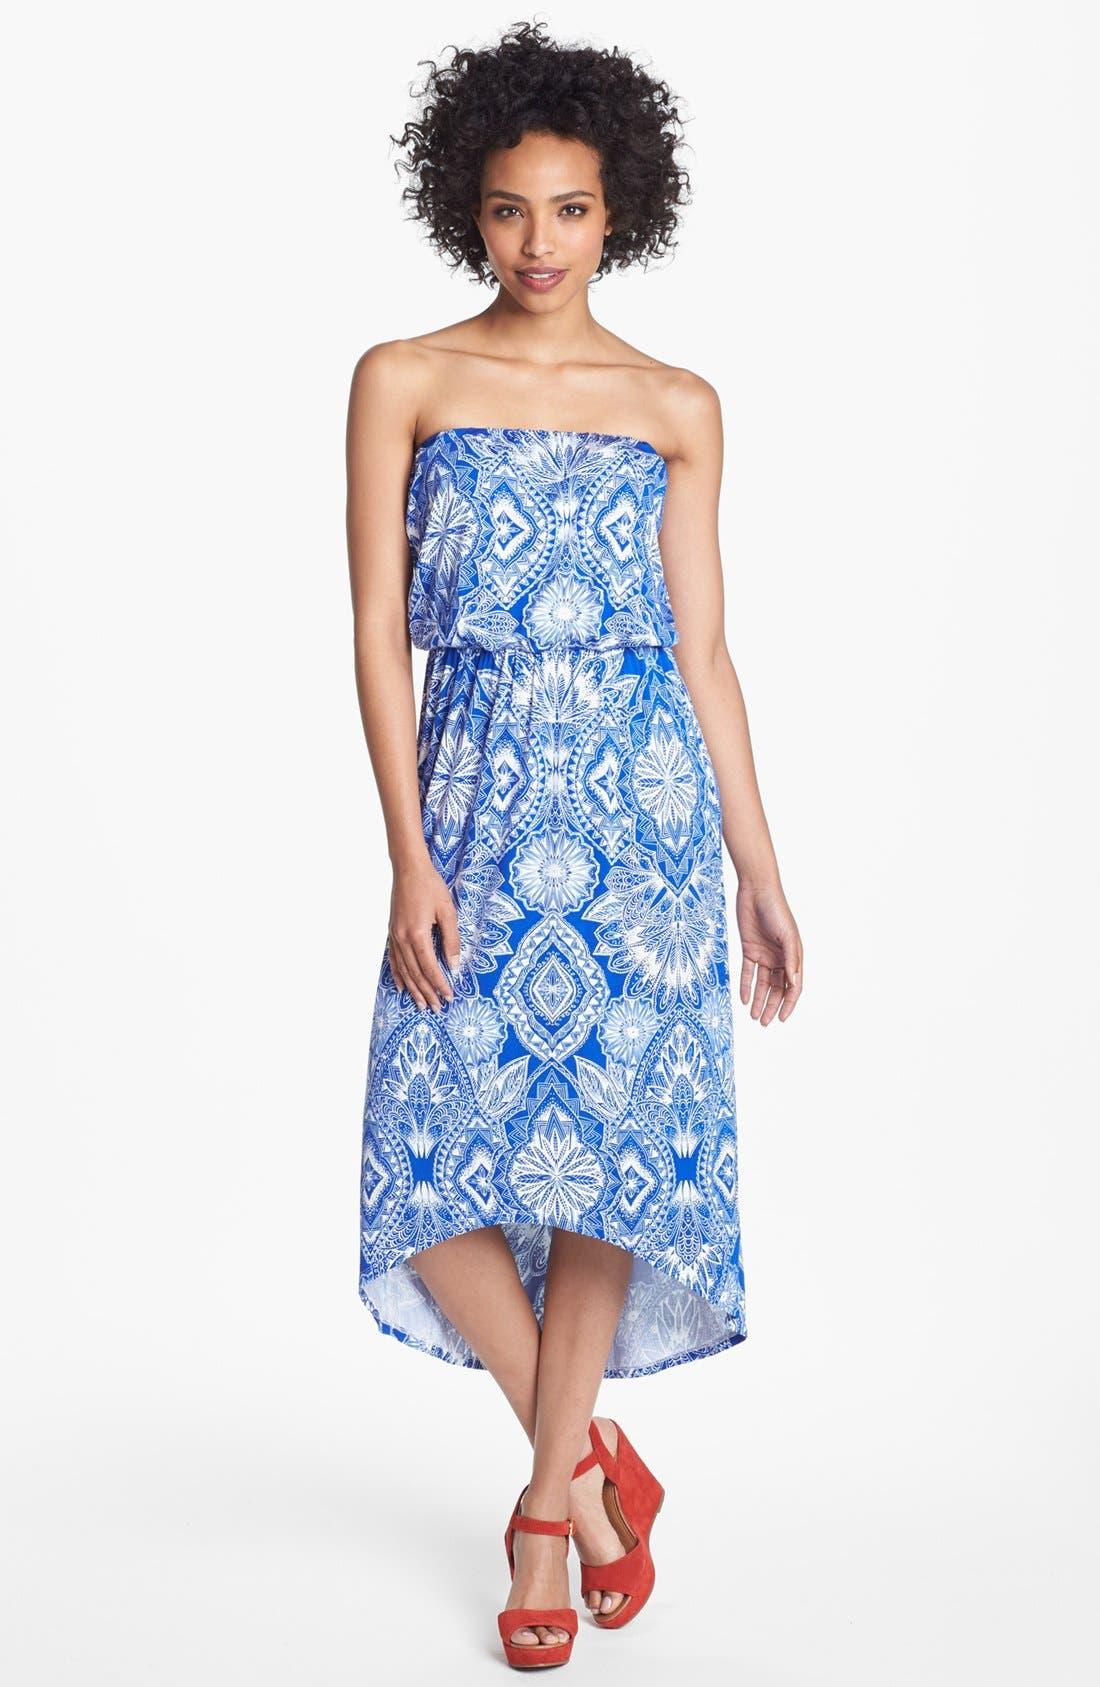 Main Image - Felicity & Coco 'Delanie' High/Low Blouson Dress (Nordstrom Exclusive)